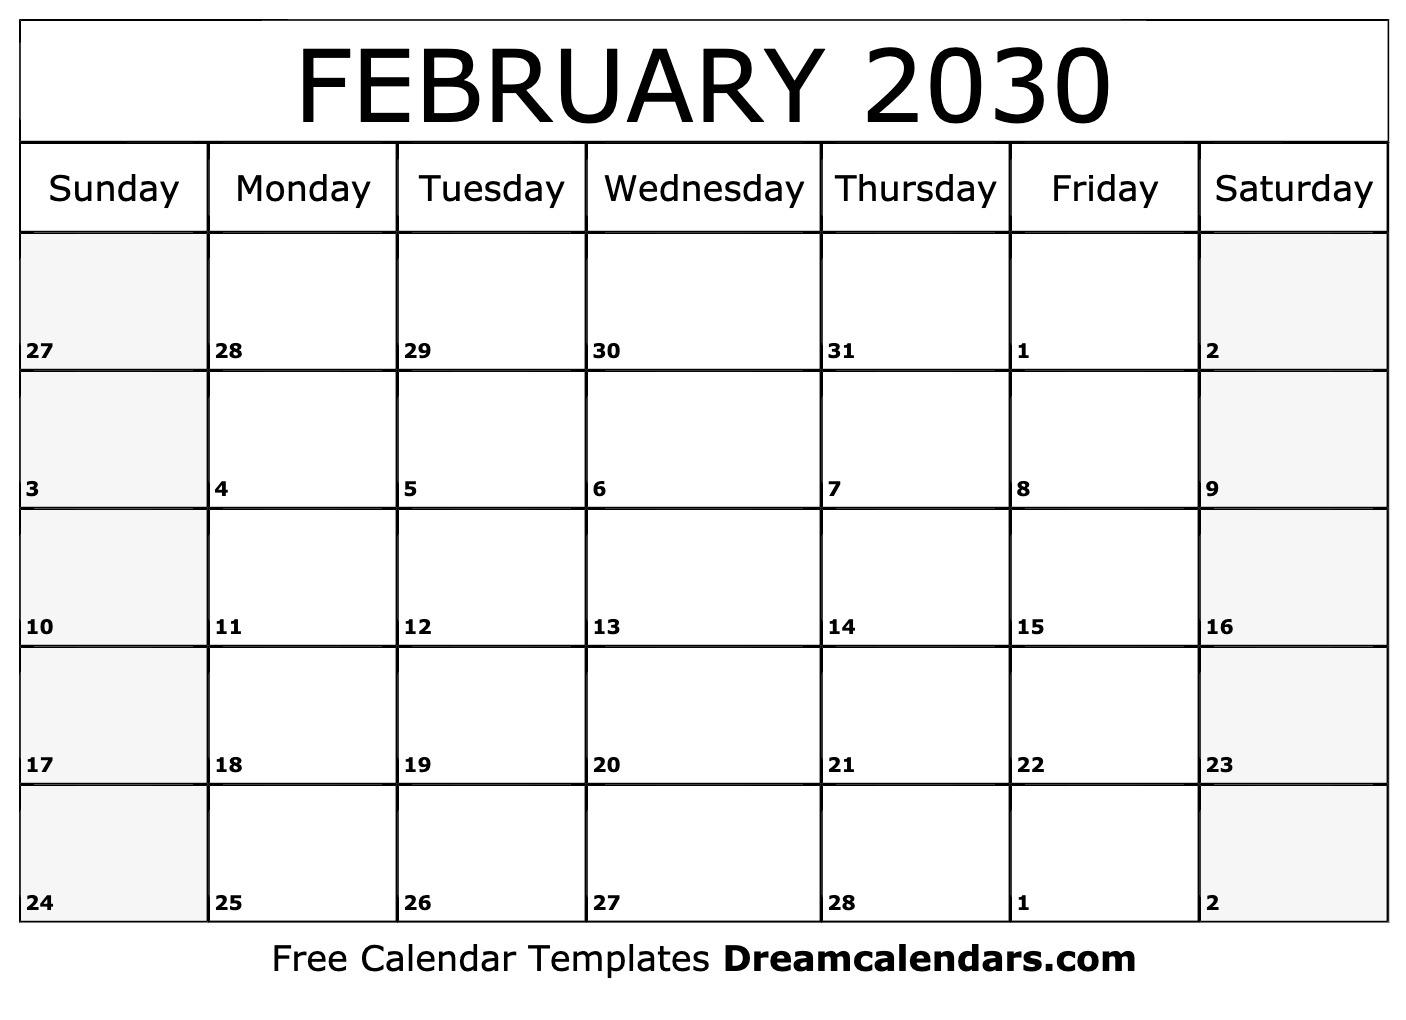 photo about February Calendar Printable referred to as Printable February 2030 Calendar